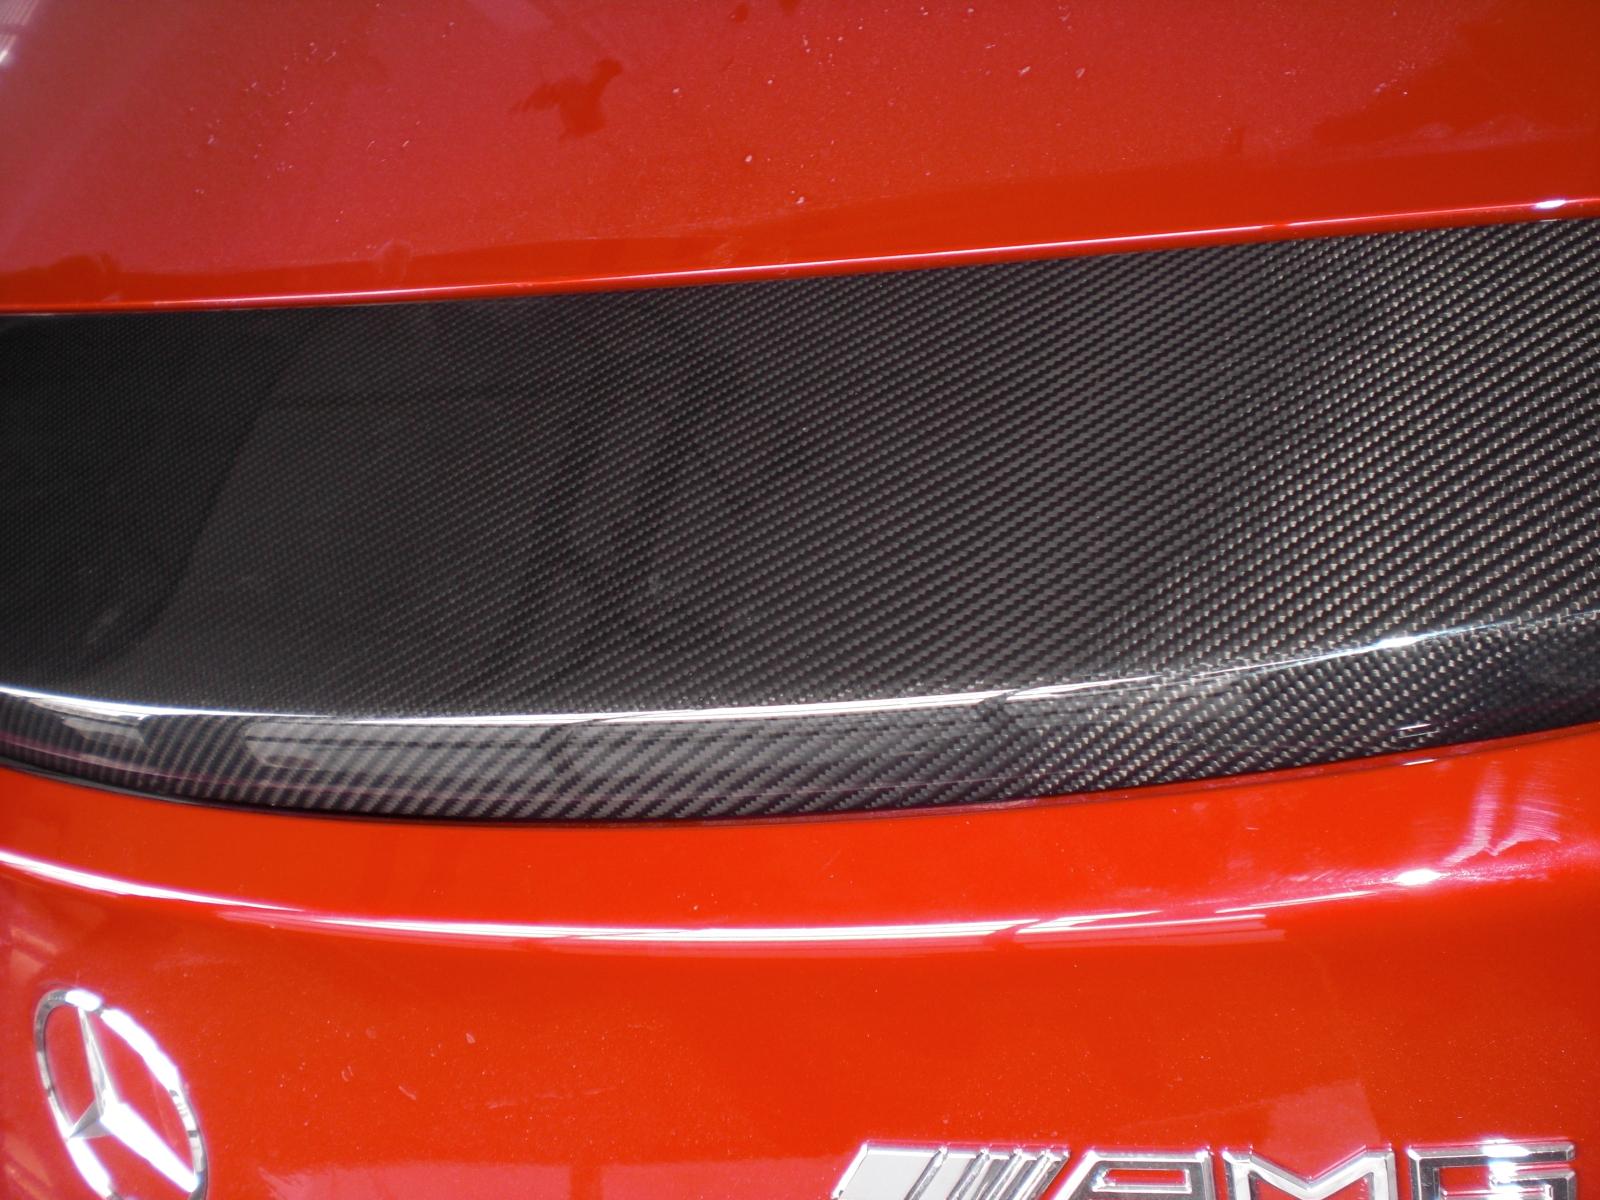 SLS C197 Black Series Heckflügel, Heckspoiler Göckel Carbon